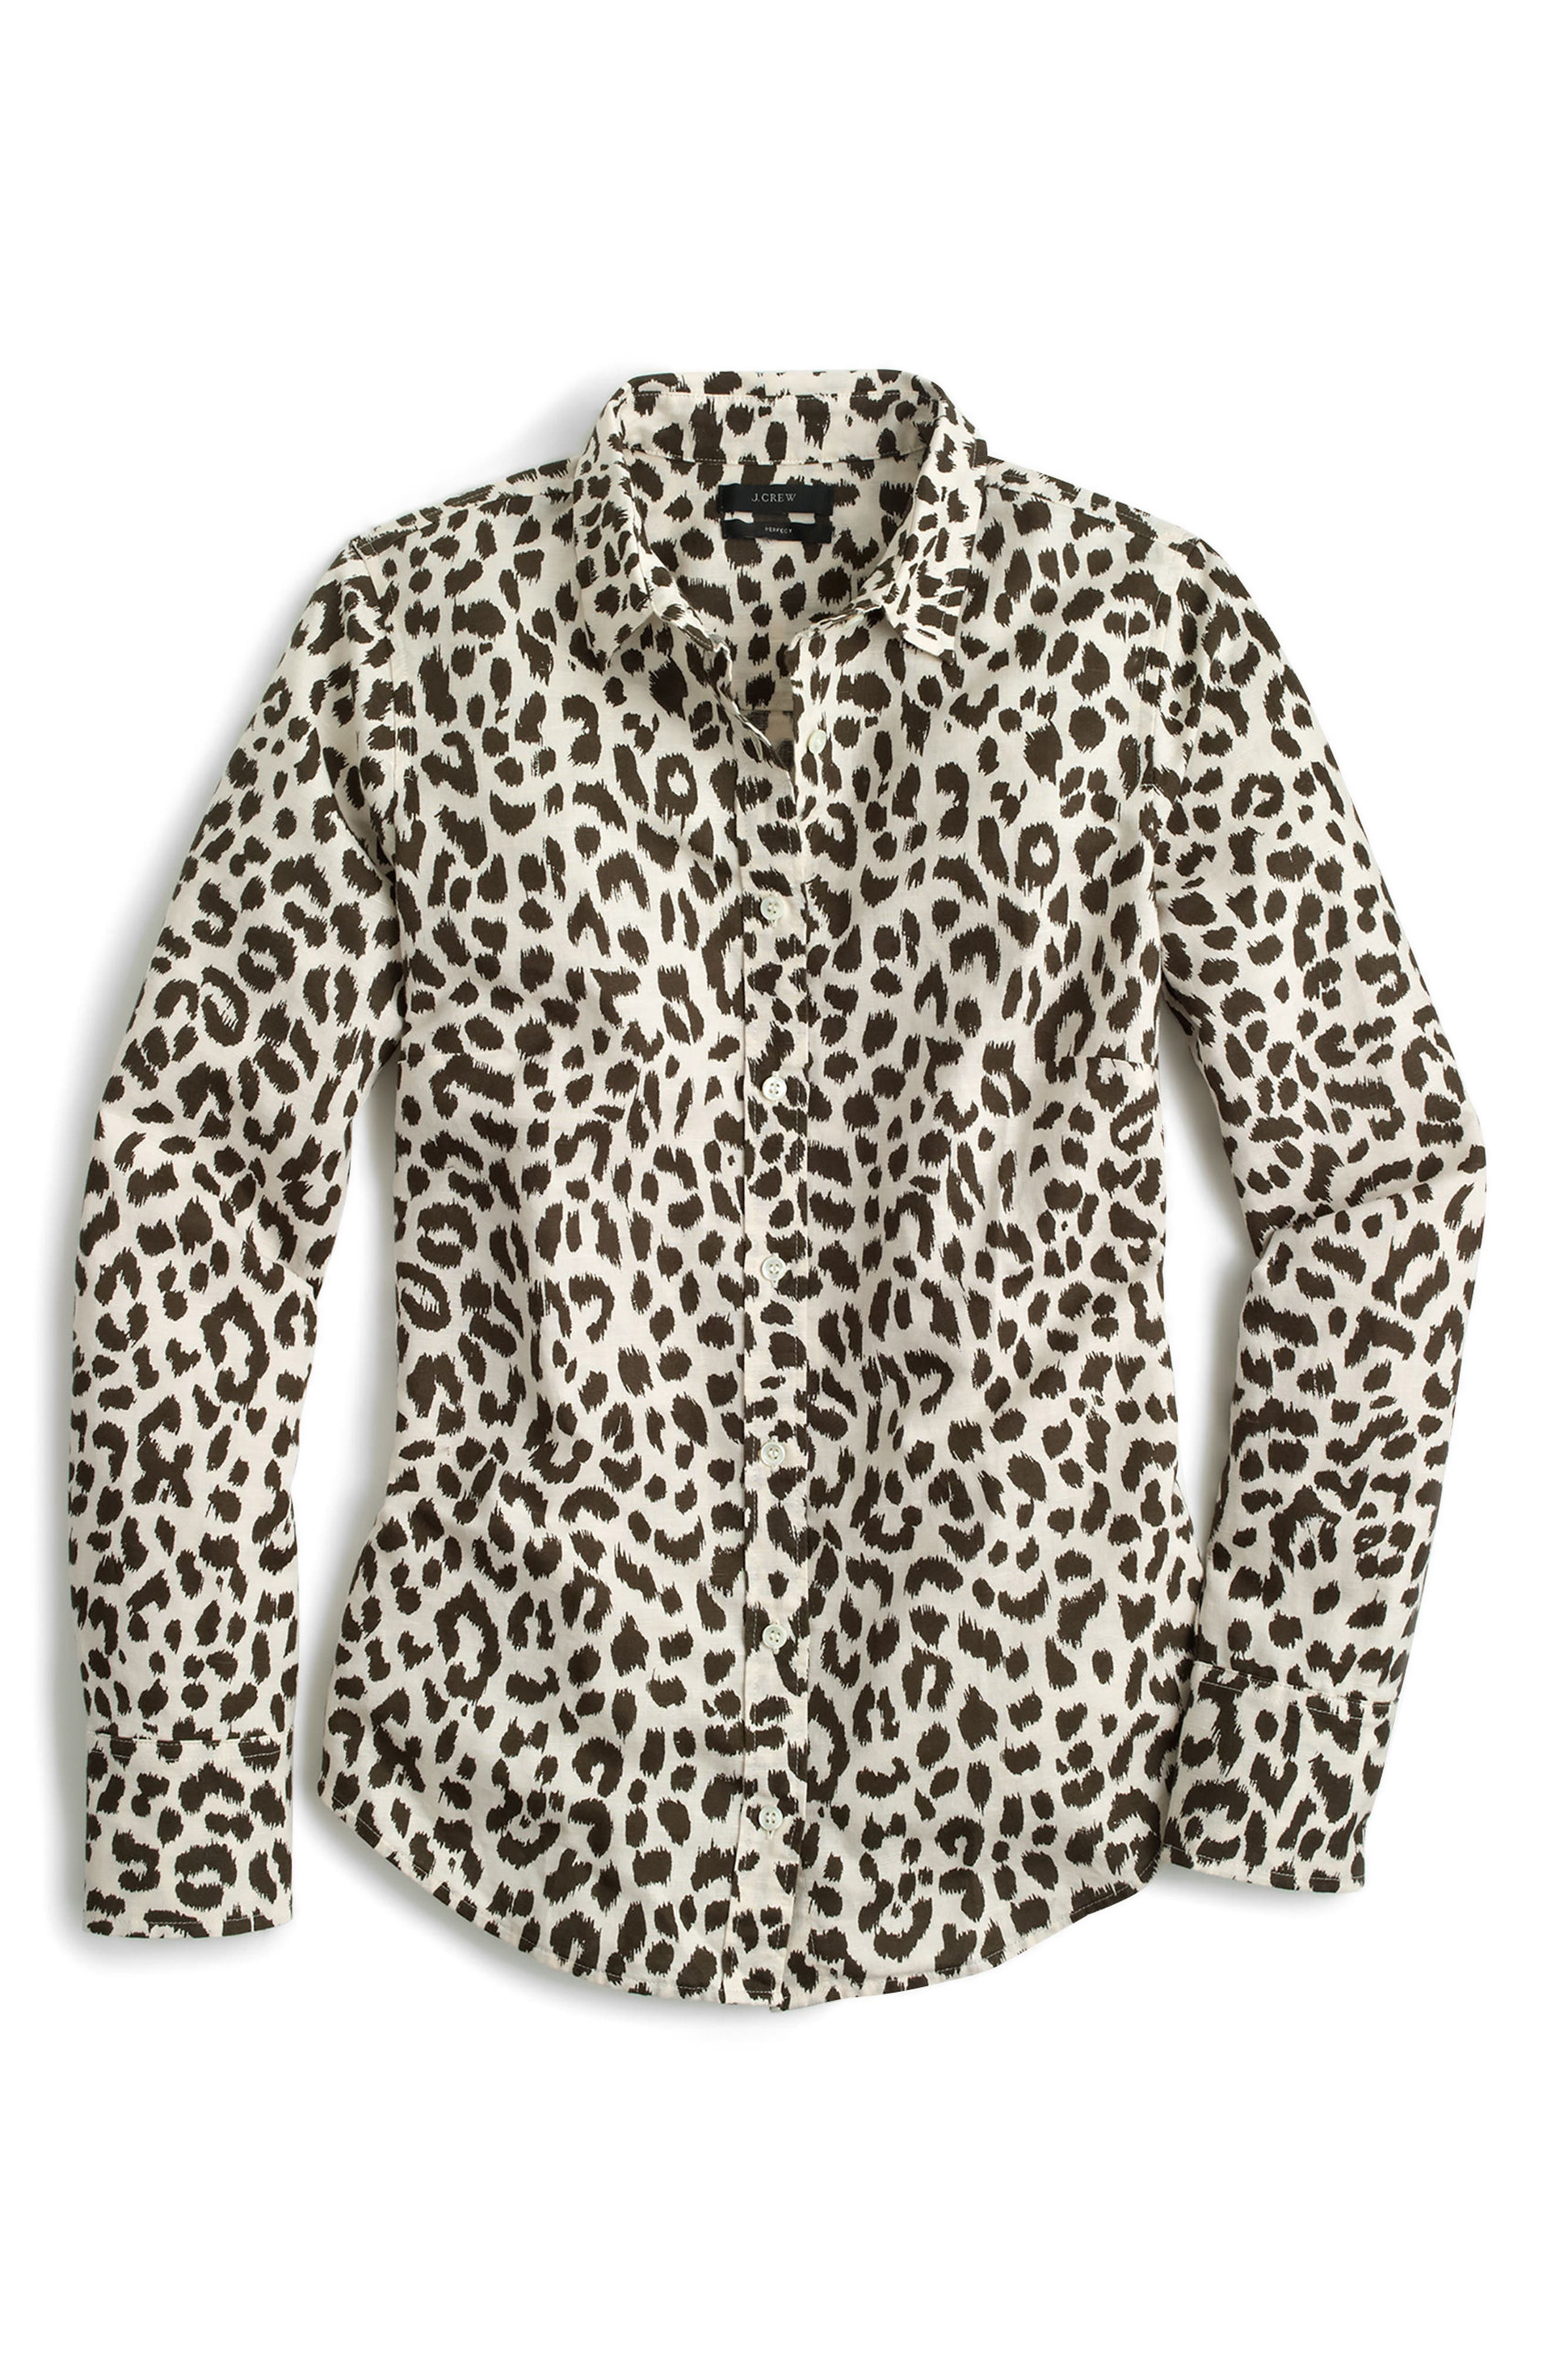 Alternate Image 3  - J.Crew Perfect Leopard Print Linen & Coton Shirt